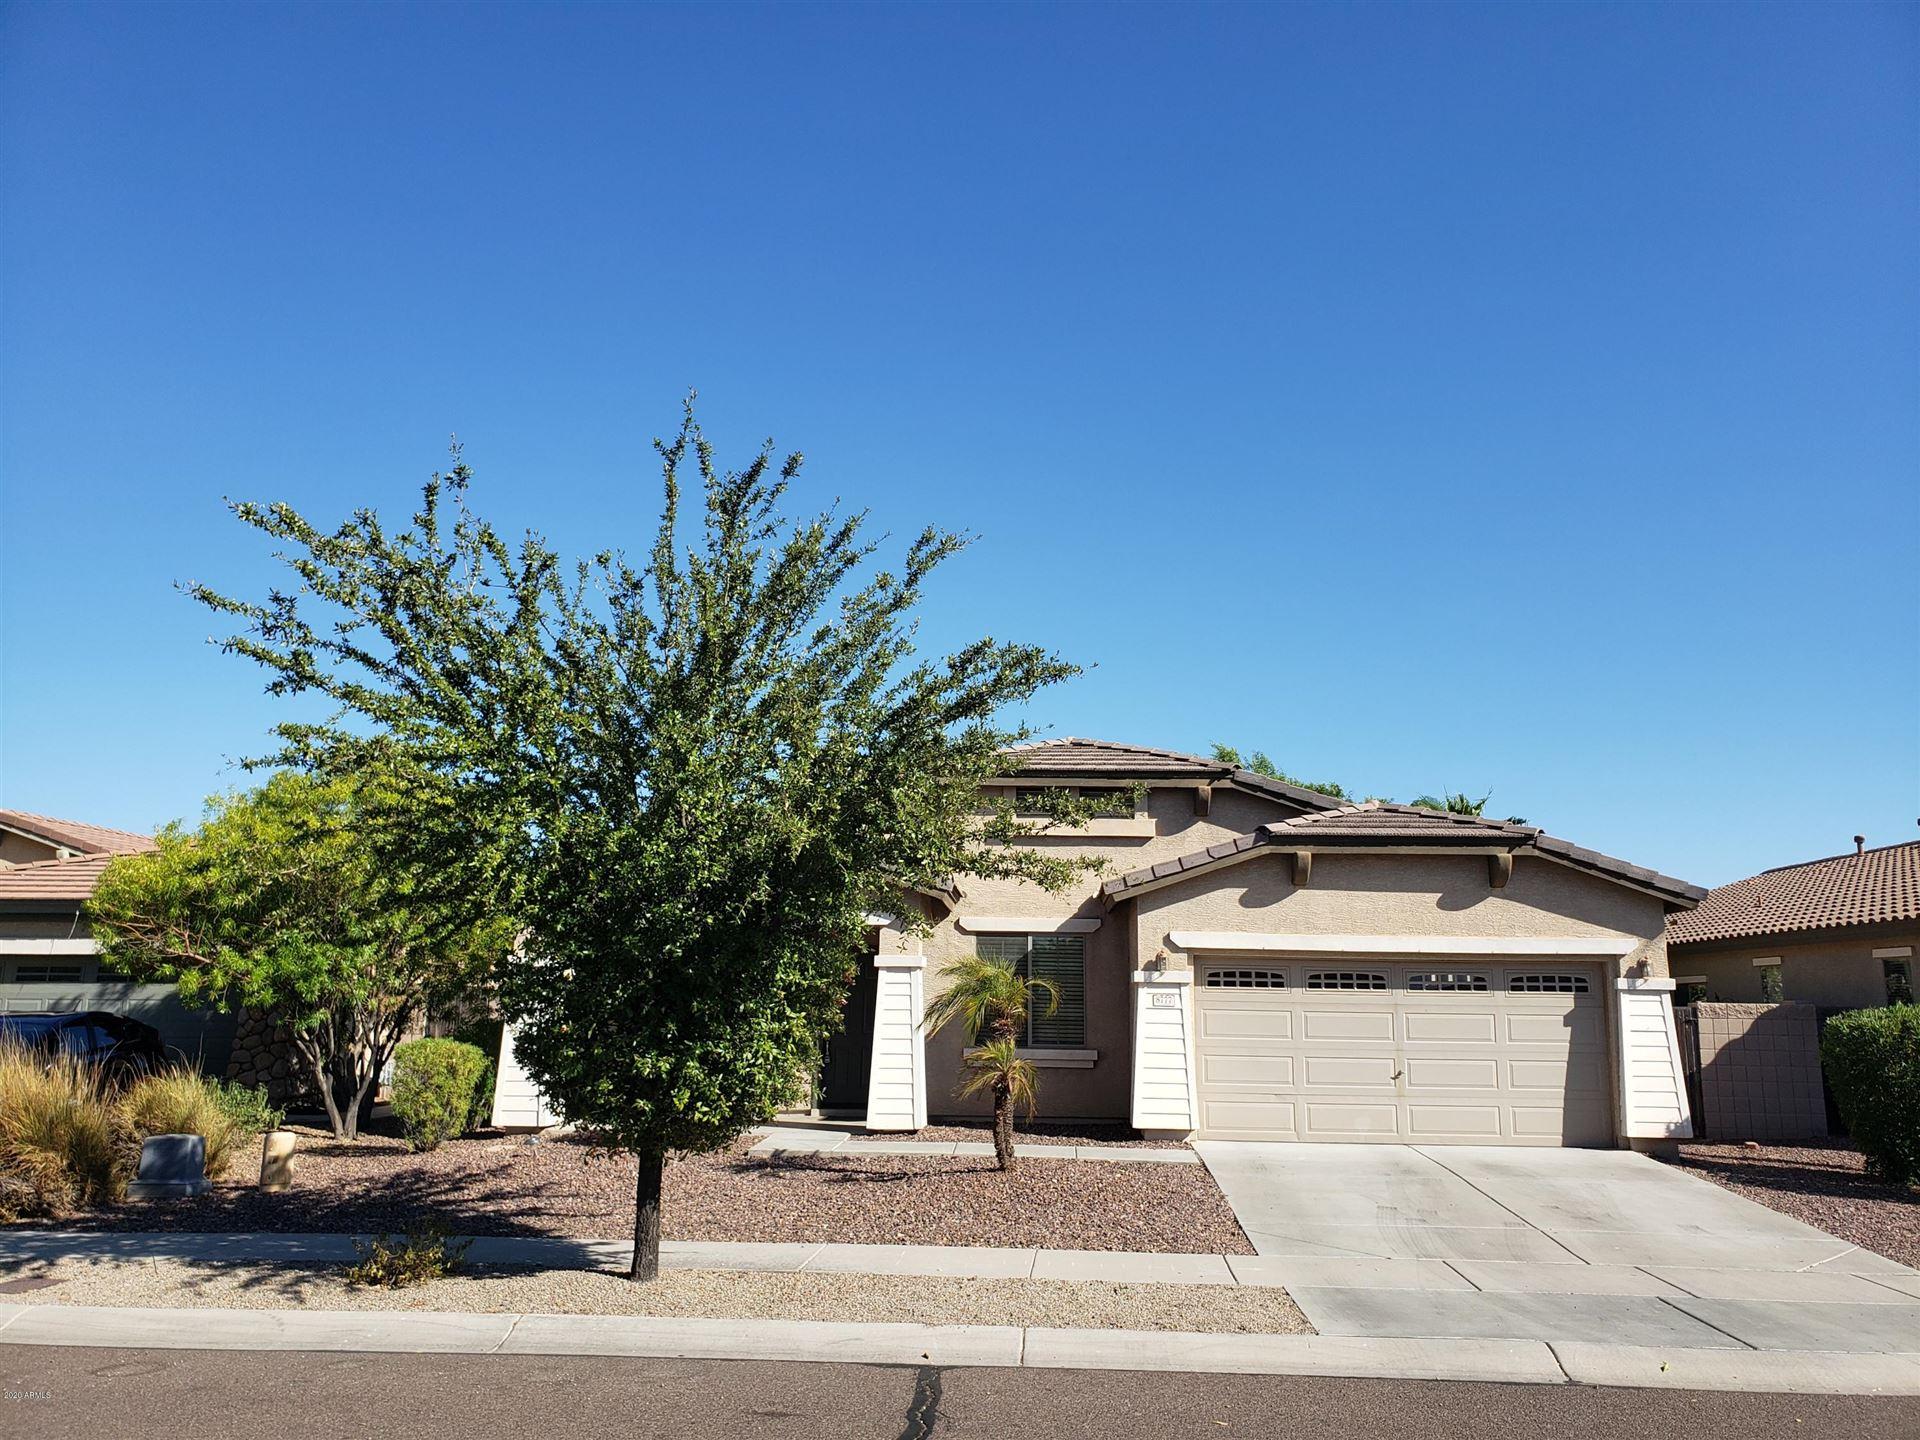 8777 W NORTHVIEW Avenue, Glendale, AZ 85305 - MLS#: 6111141